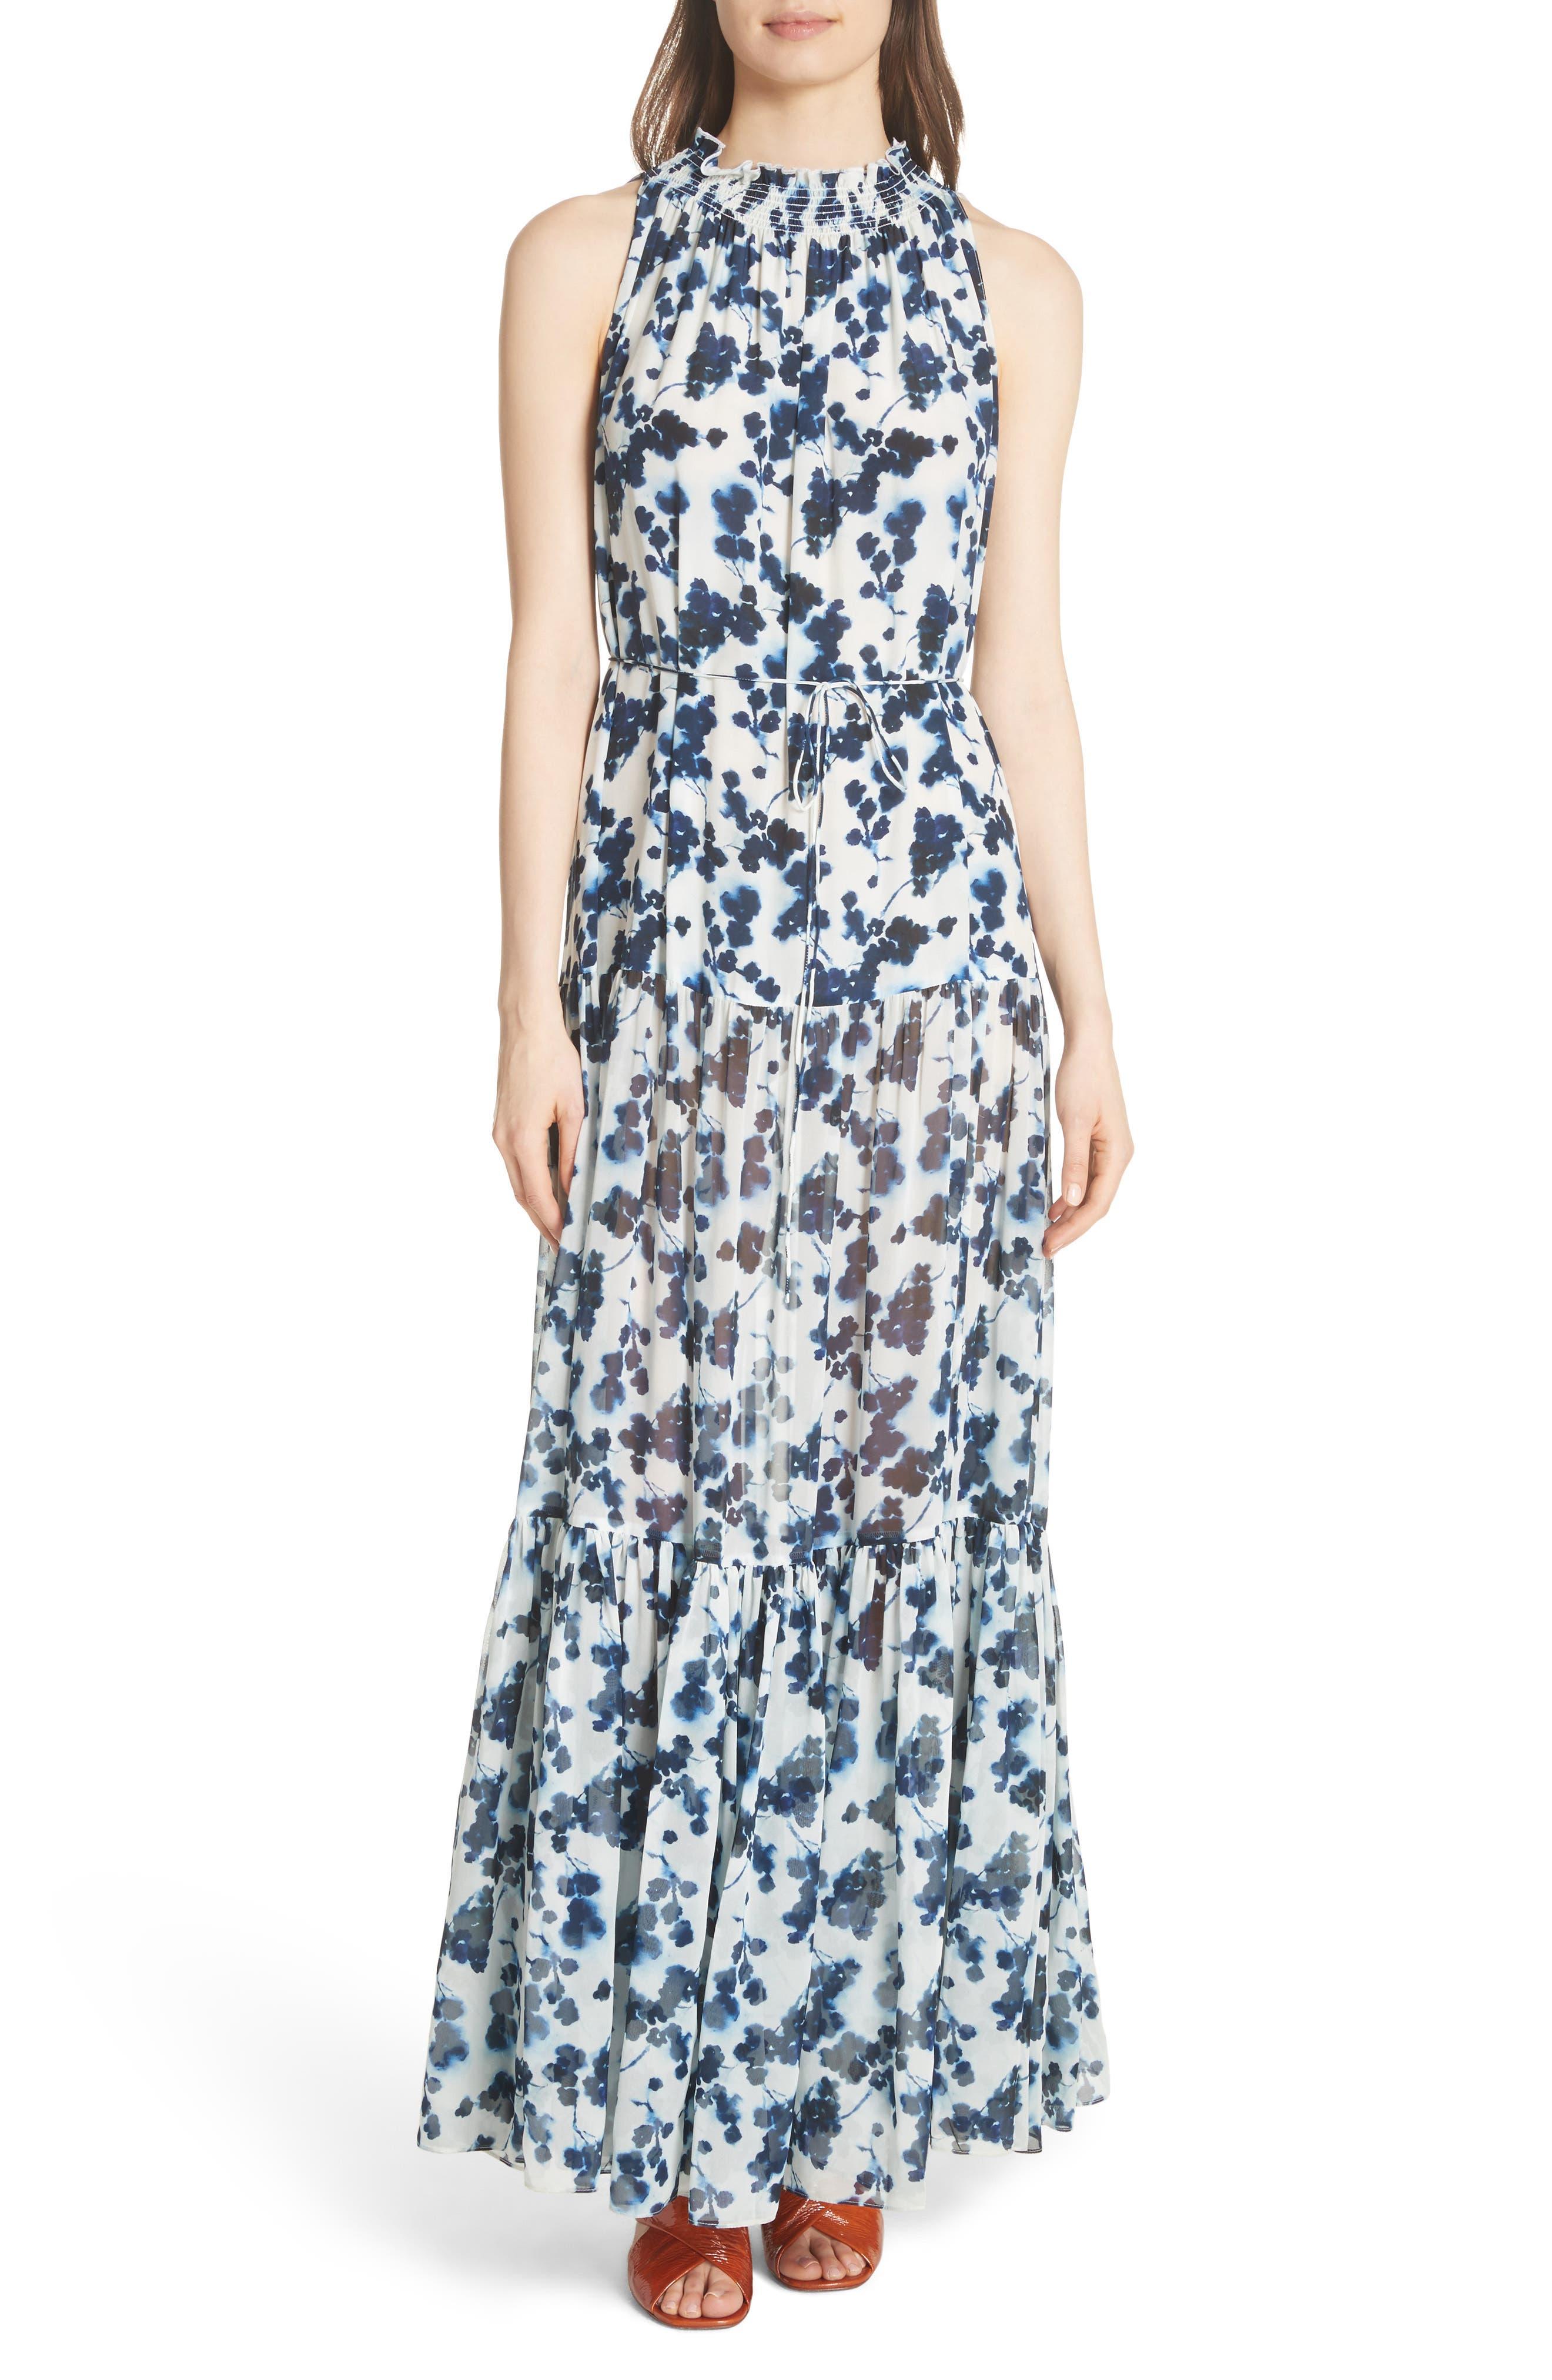 Alternate Image 1 Selected - Elizabeth and James Lani P Floral Print Silk Dress